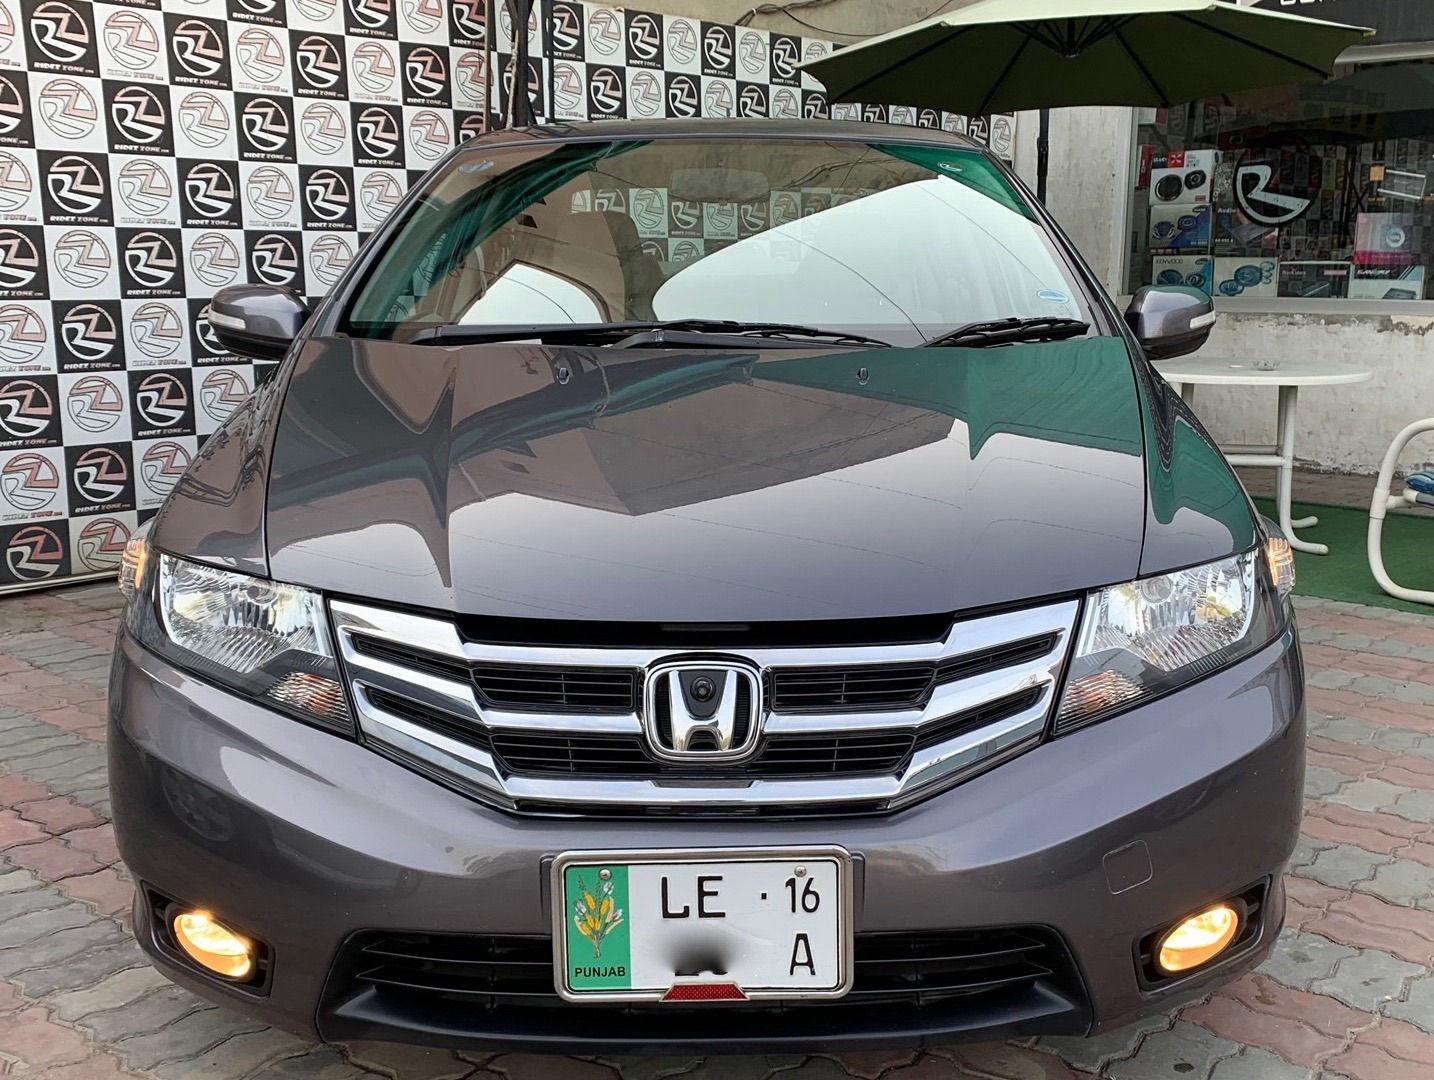 Honda City 1.5 i-VTEC Prosmatec 2016